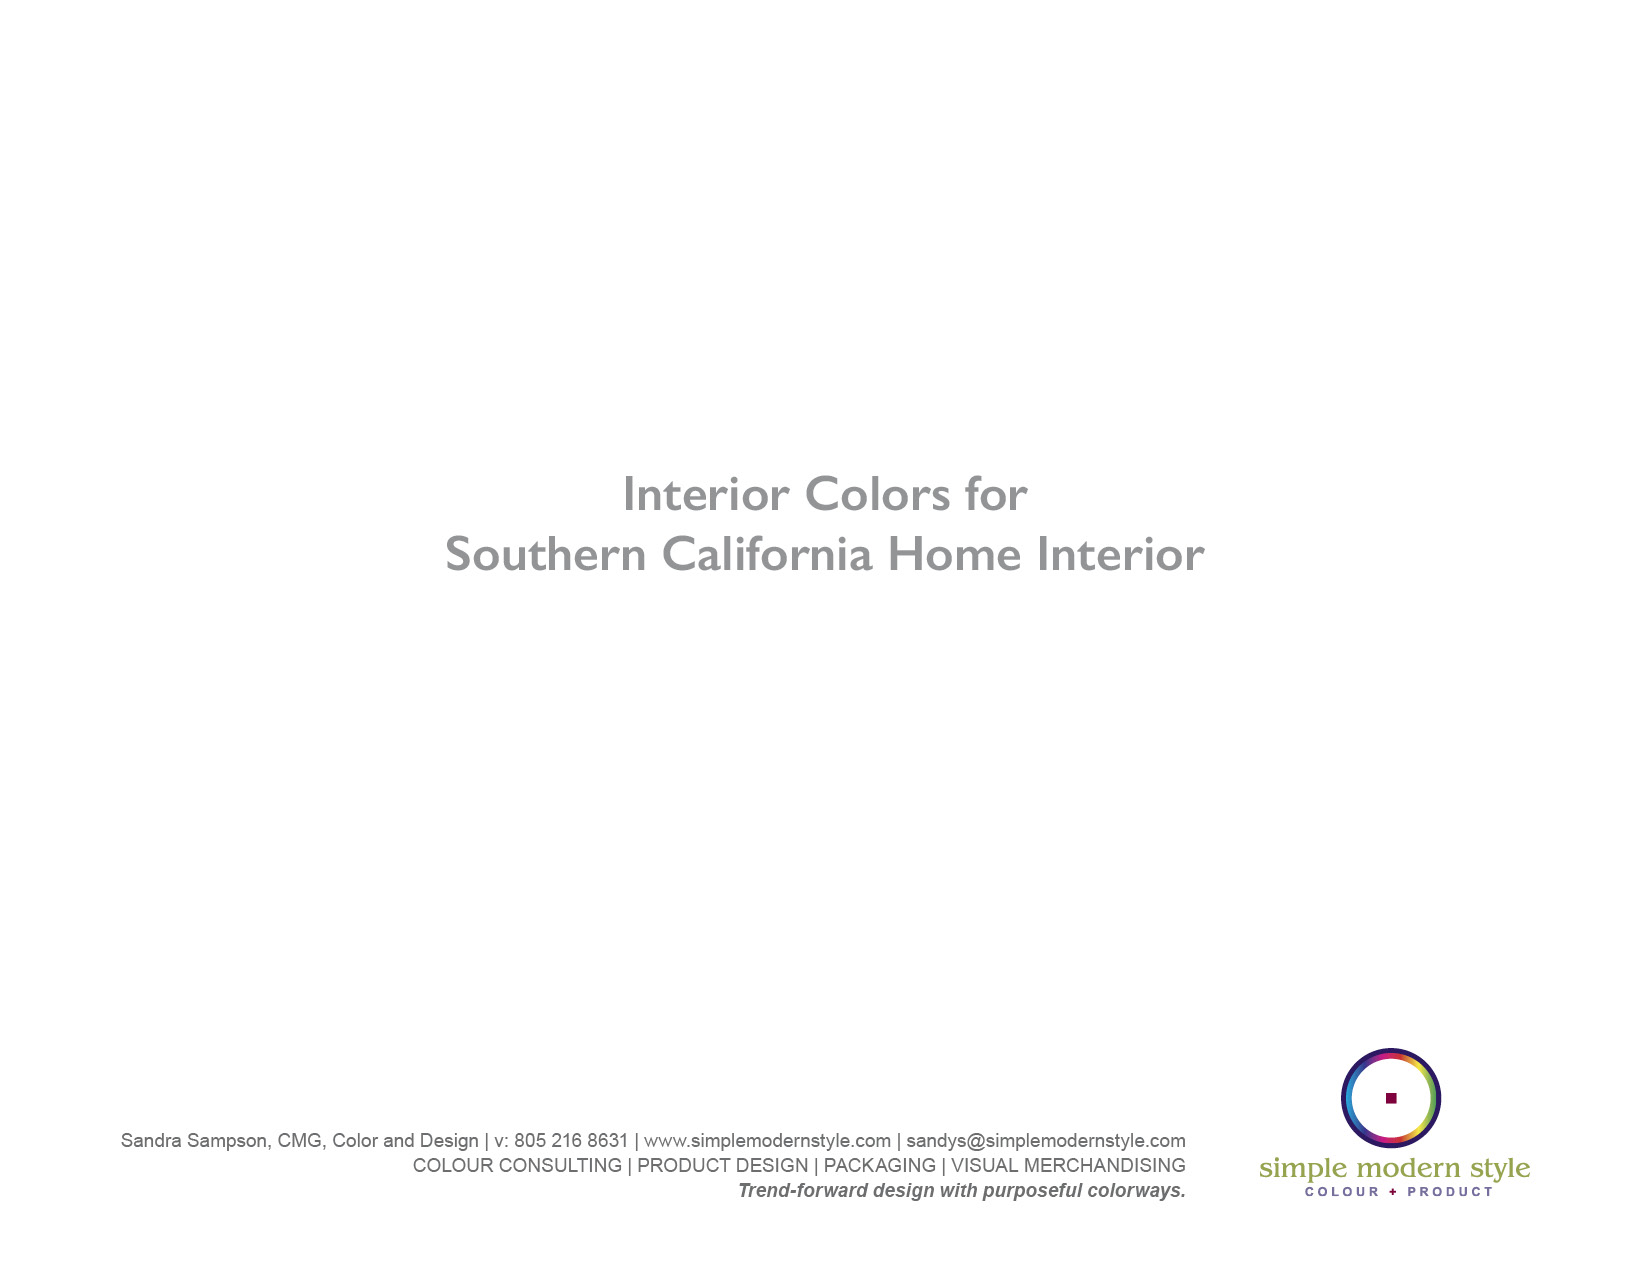 SMS_Interior_Home_Colors_Case_Study.jpg